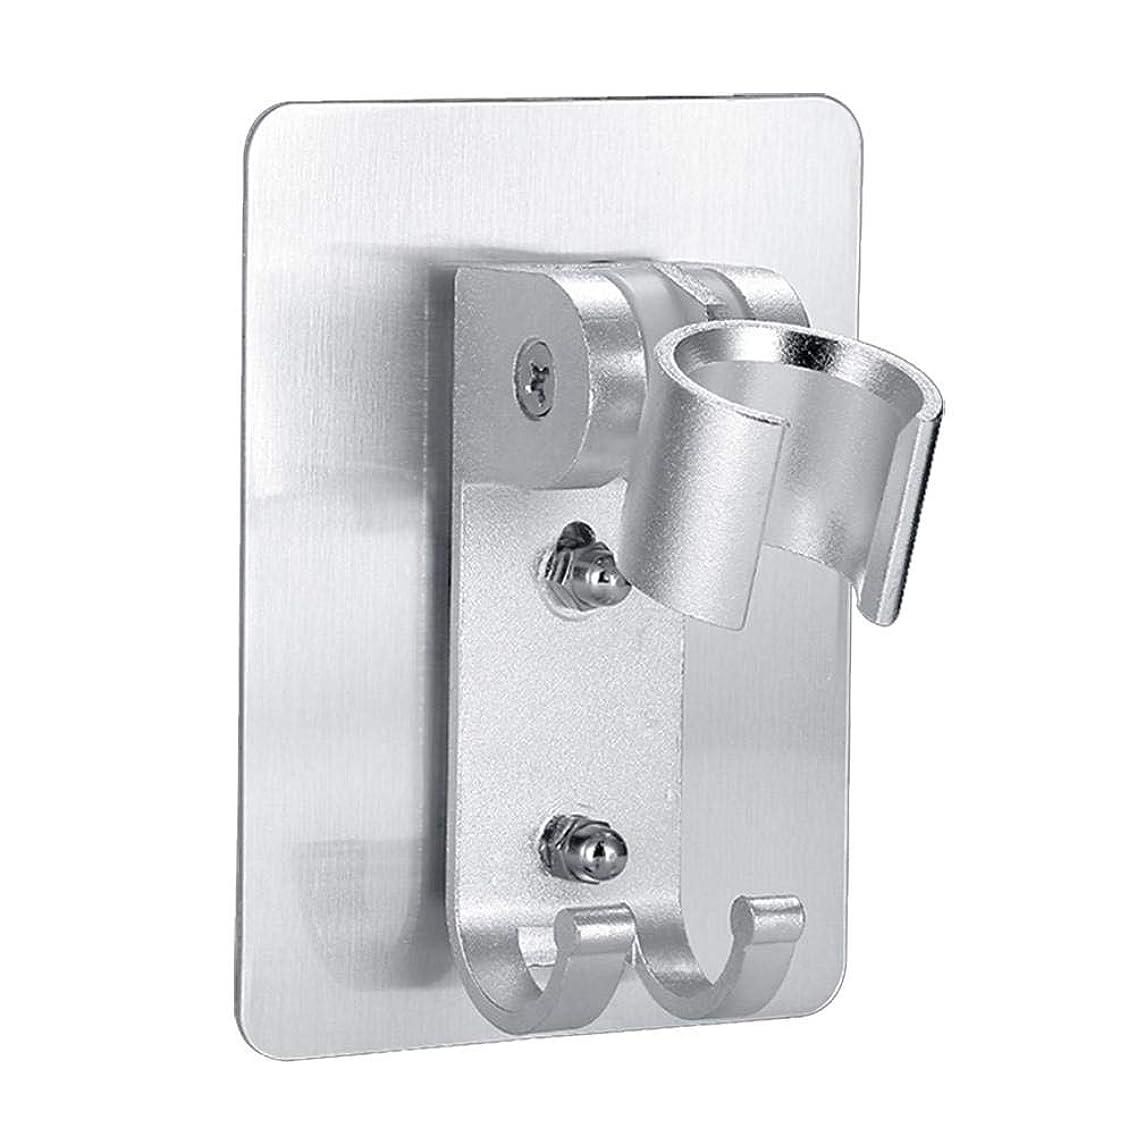 Ochoos Adjustable Shower Nozzle Mount Brackets Aluminum Alloy Traceless Nail-Free Pratical for Bathroom Accessories